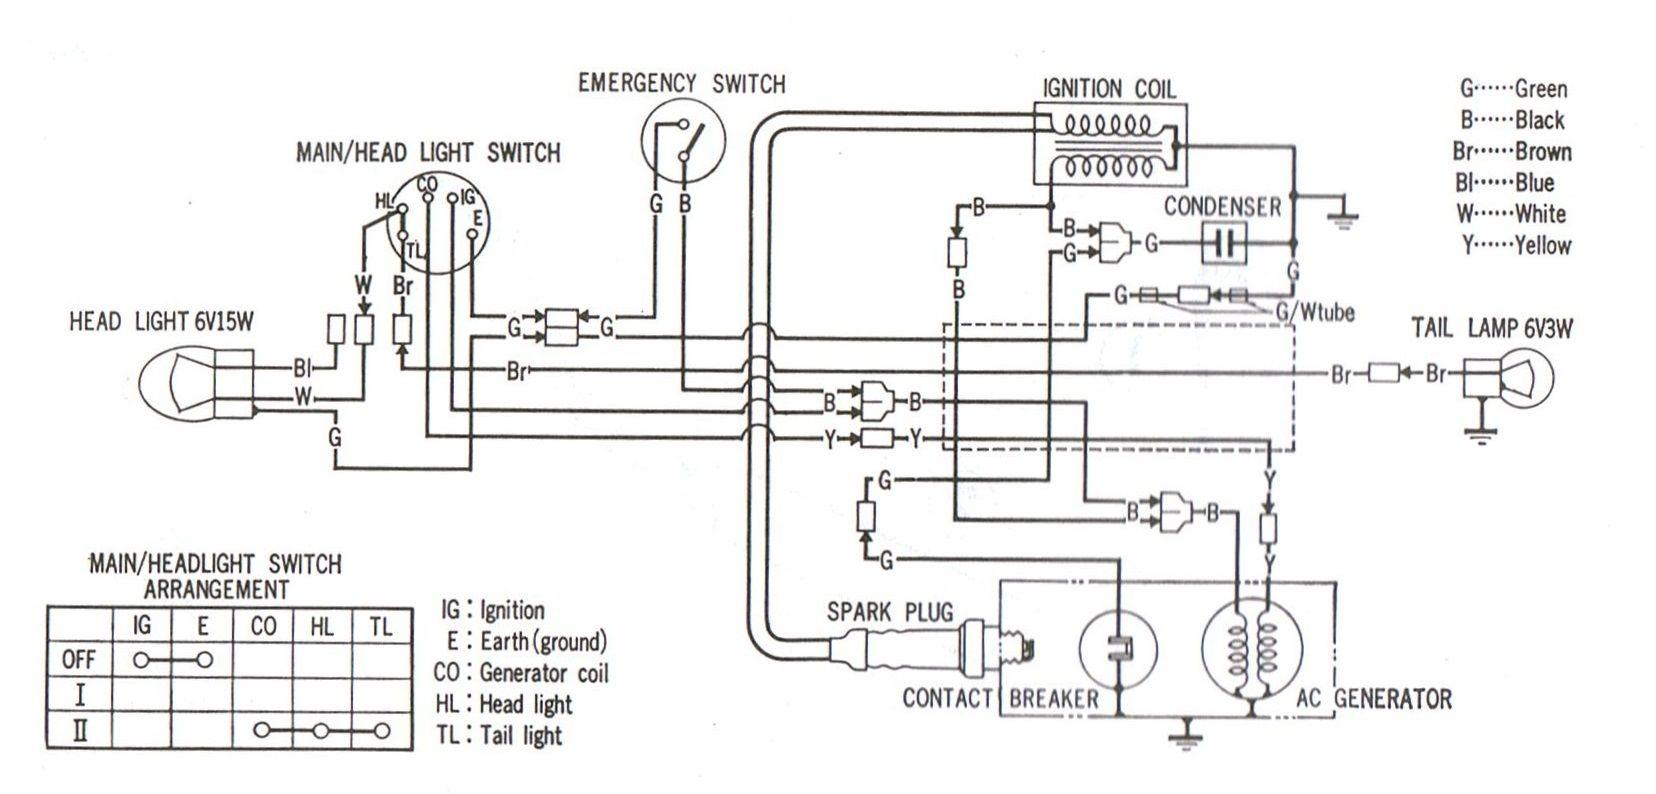 hight resolution of extraordinary 1982 honda c70 passport wiring diagram gallery best volvo c70 wiring diagram pdf c70 wiring diagram